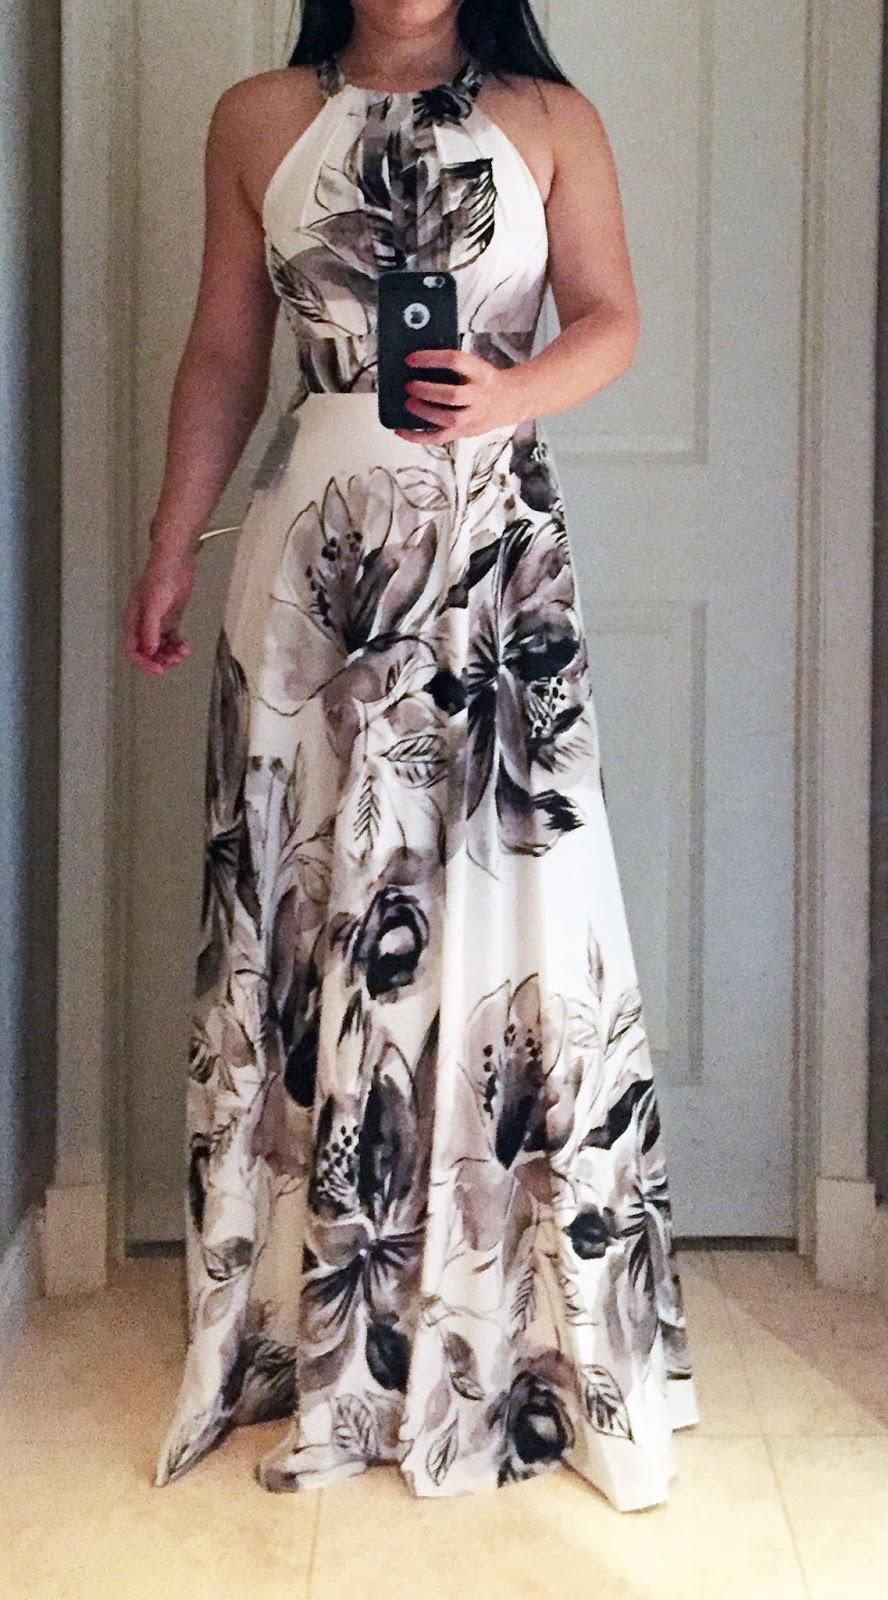 My Superficial Endeavors: Dresses!